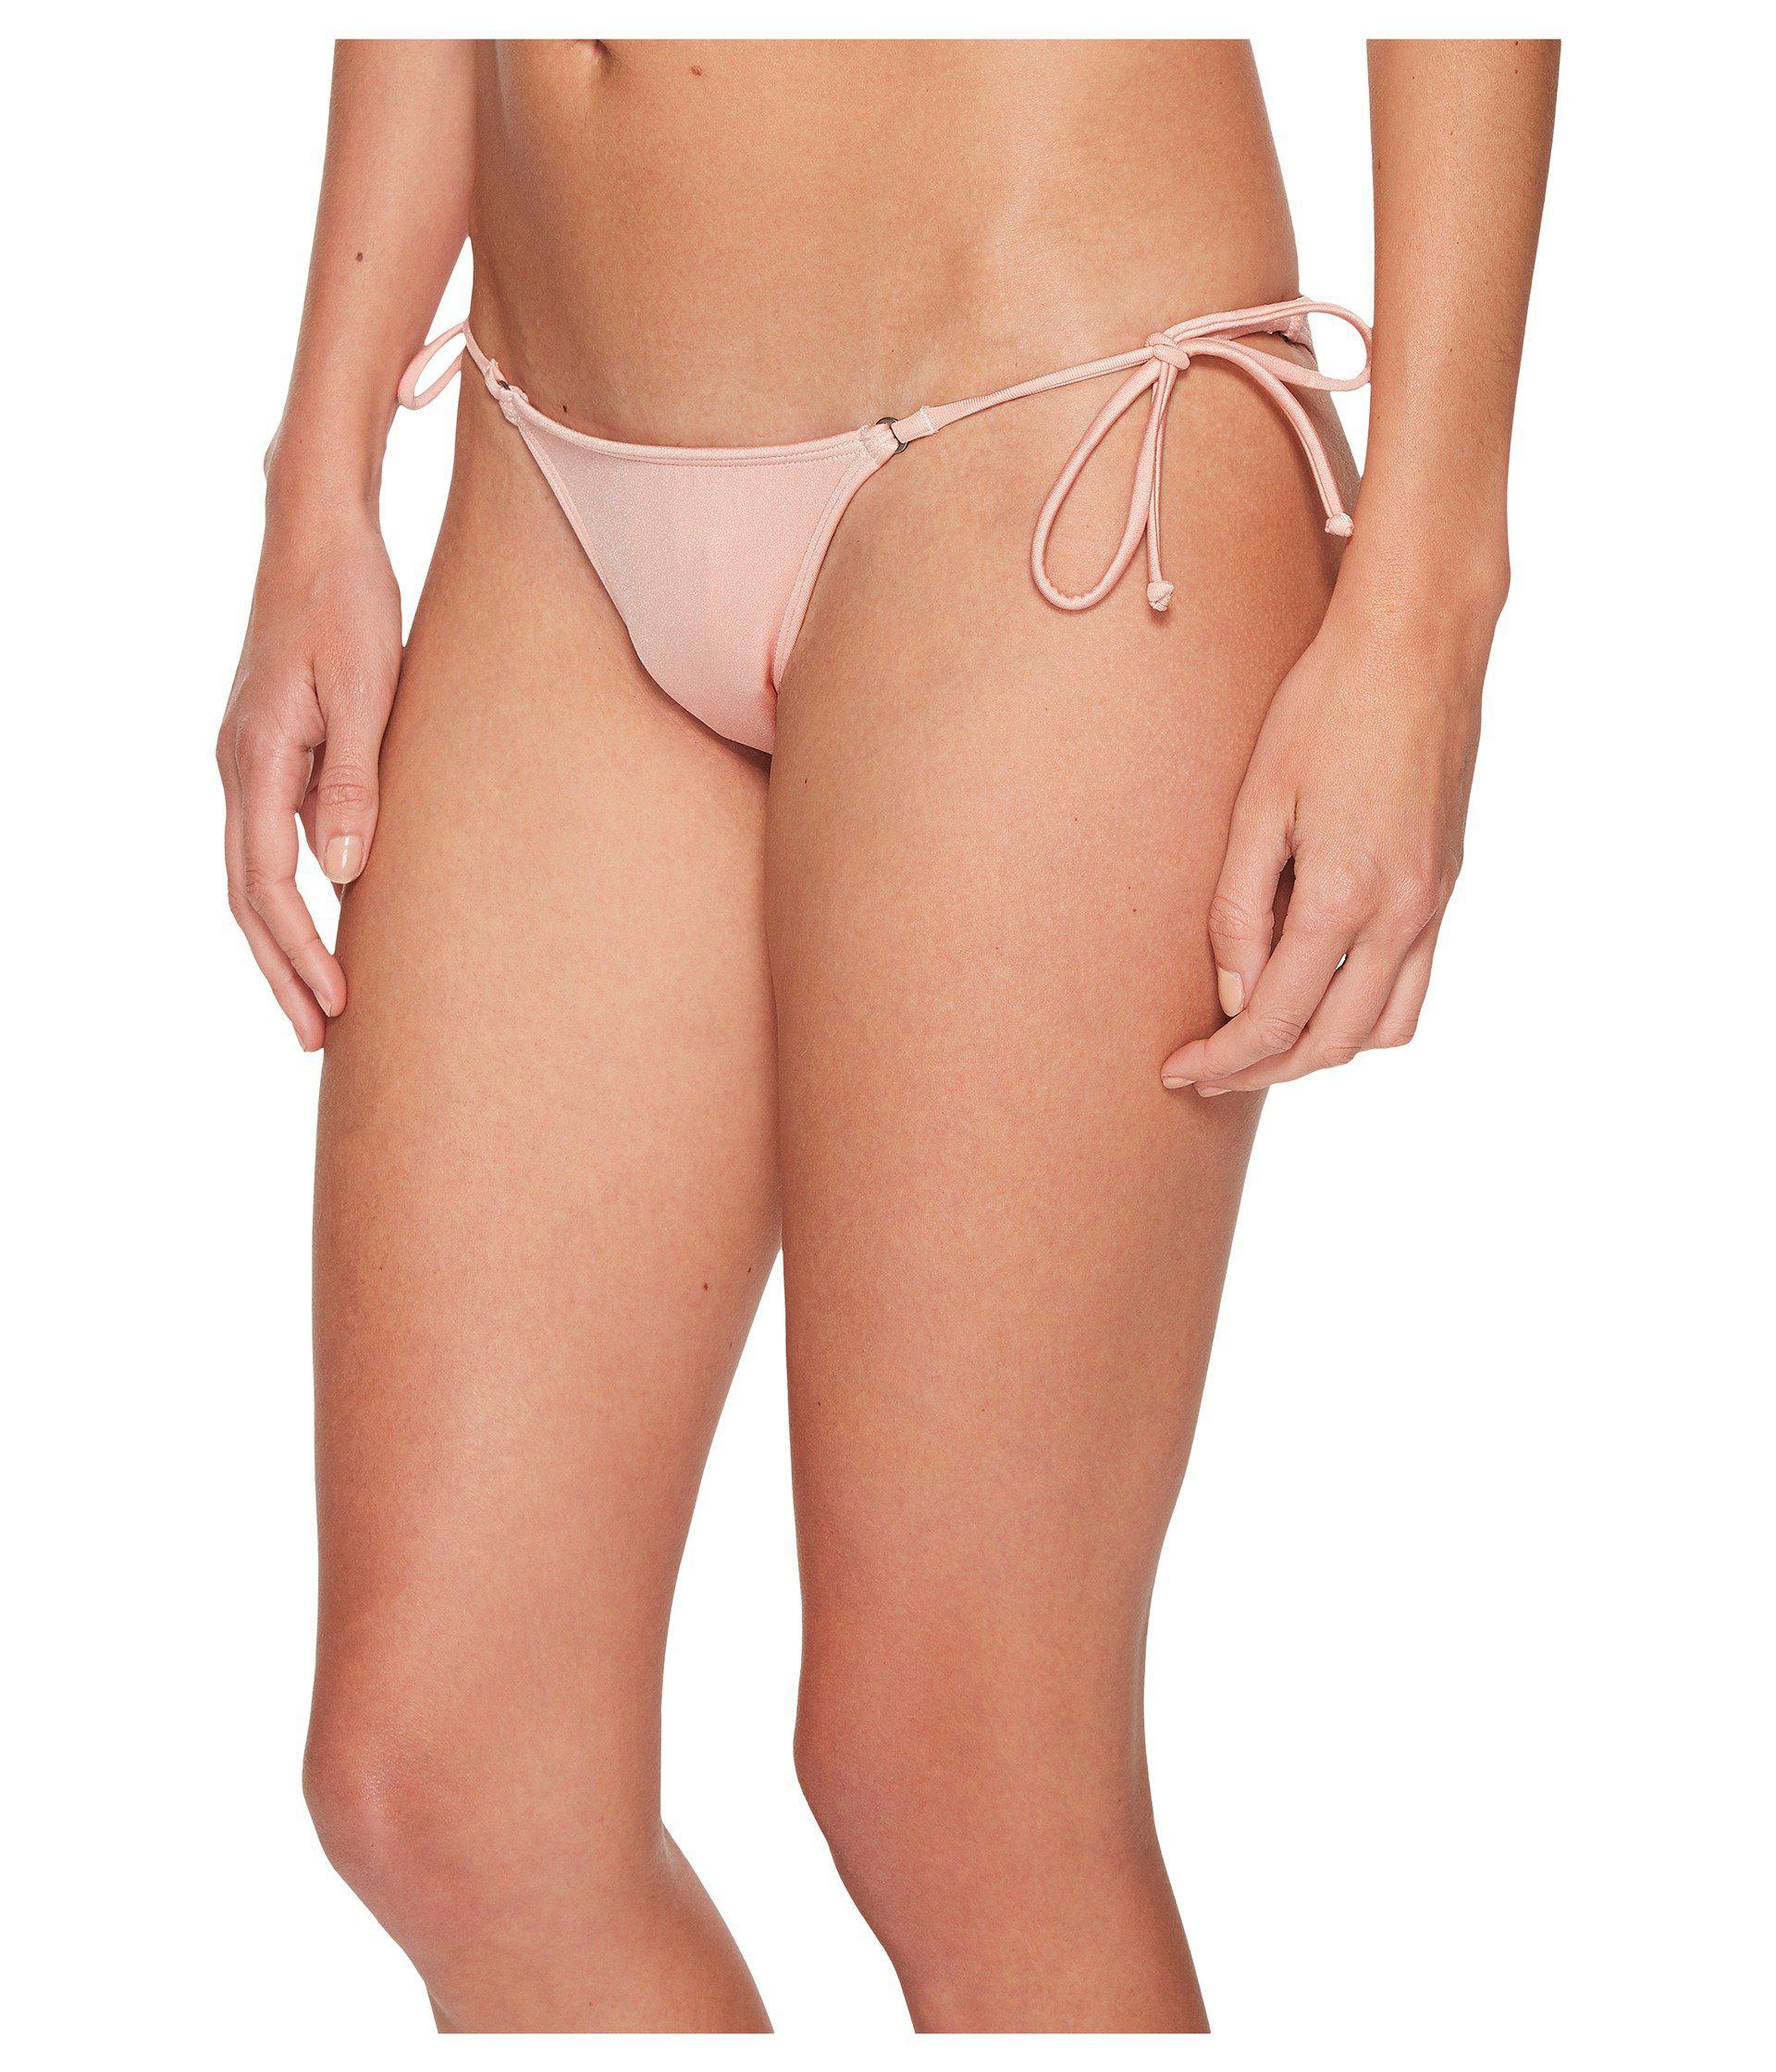 a3e5b9a37c Lyst - Billabong Sol Searcher Tie Side Isla Bikini Bottom